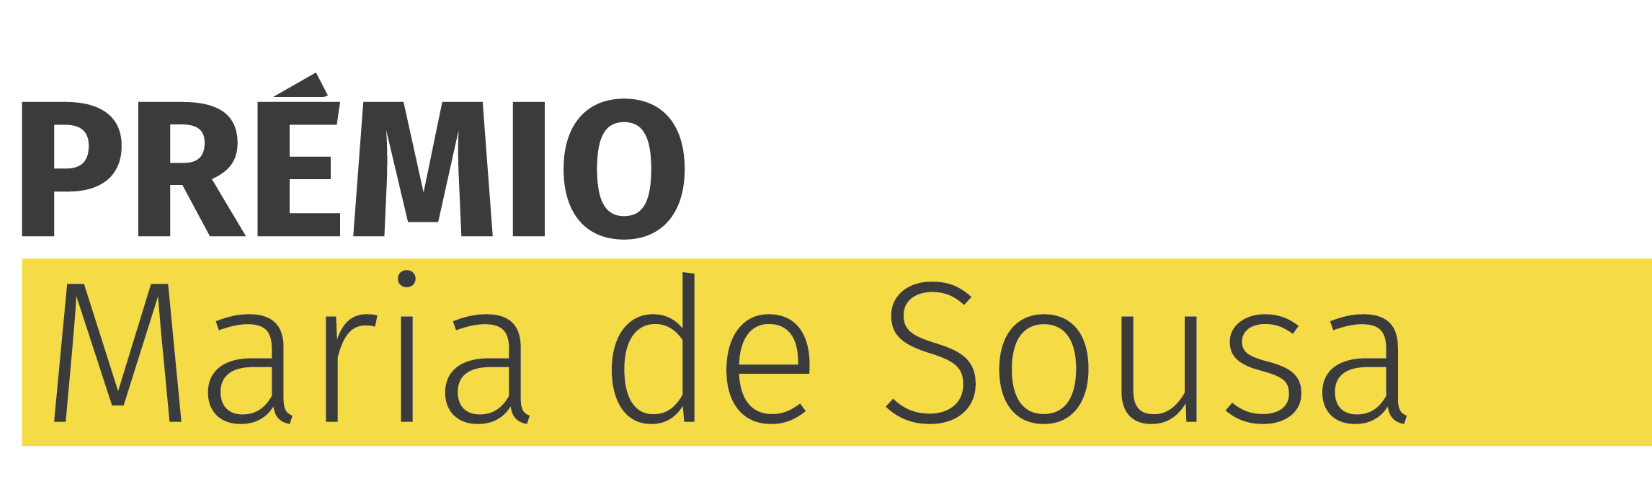 Prémio Maria de So...